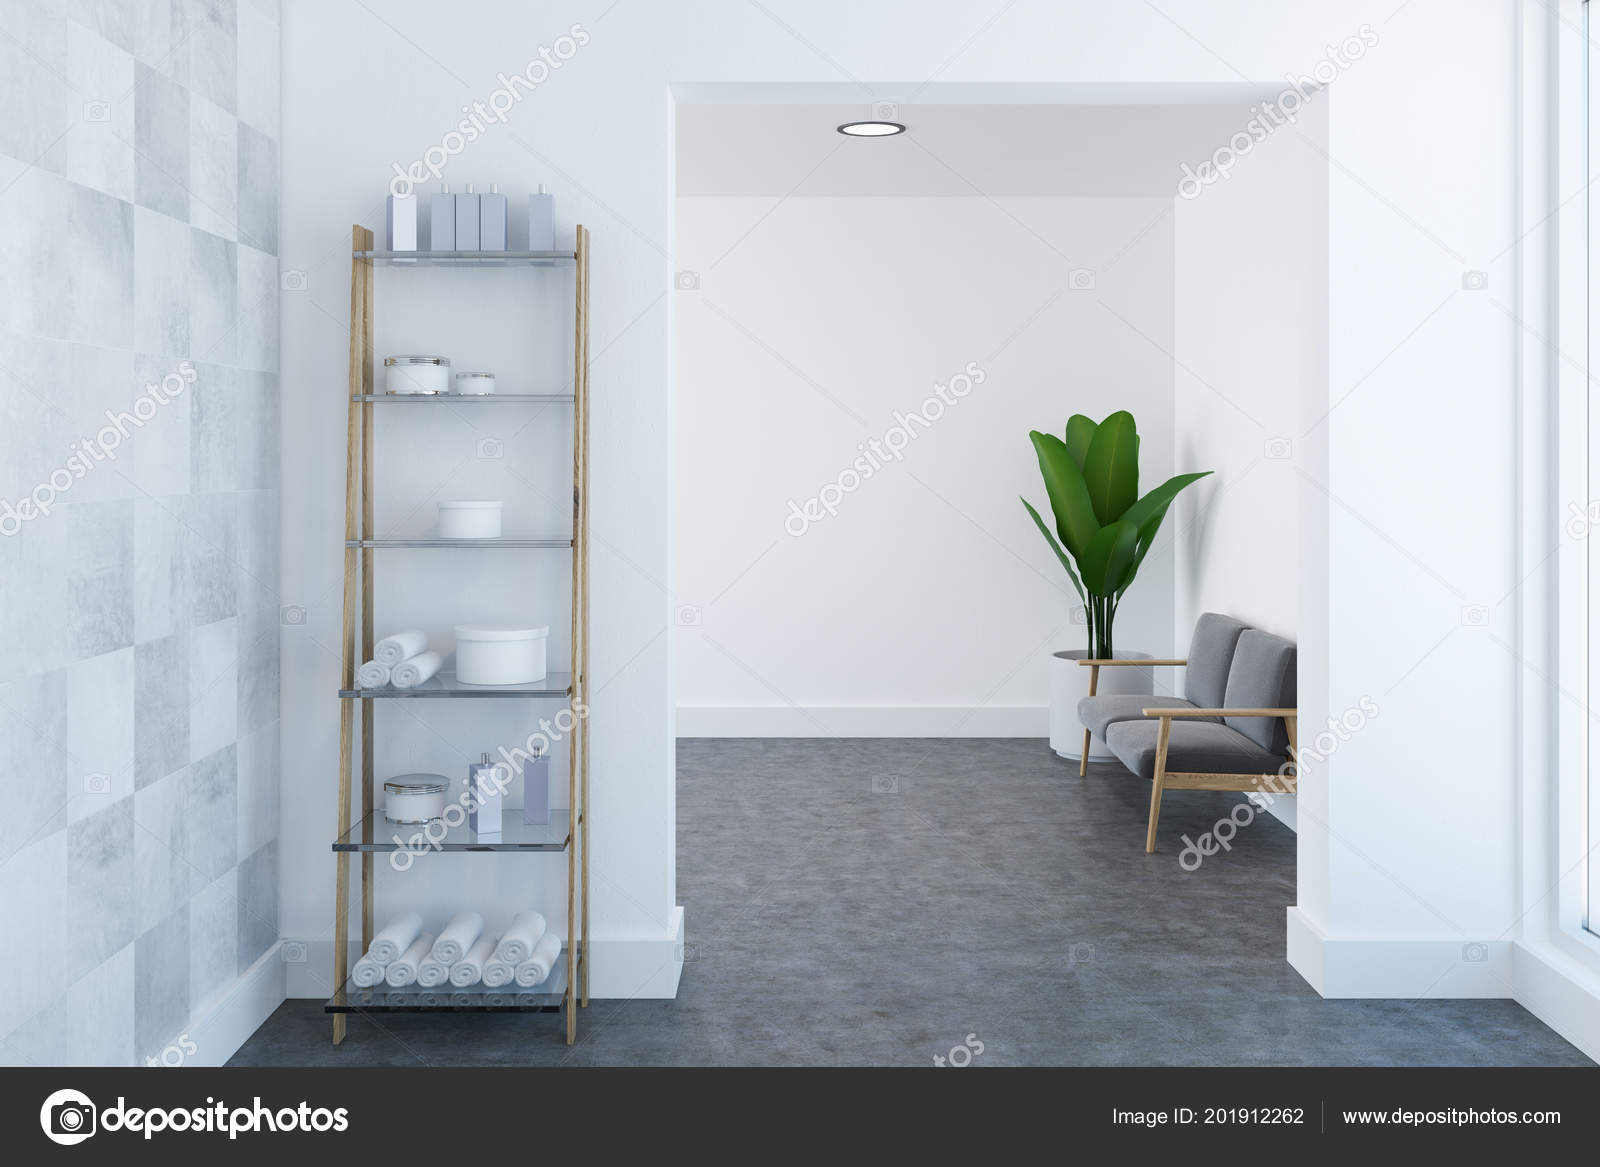 Empty Bathroom Interior White Walls Concrete Floor Shelves